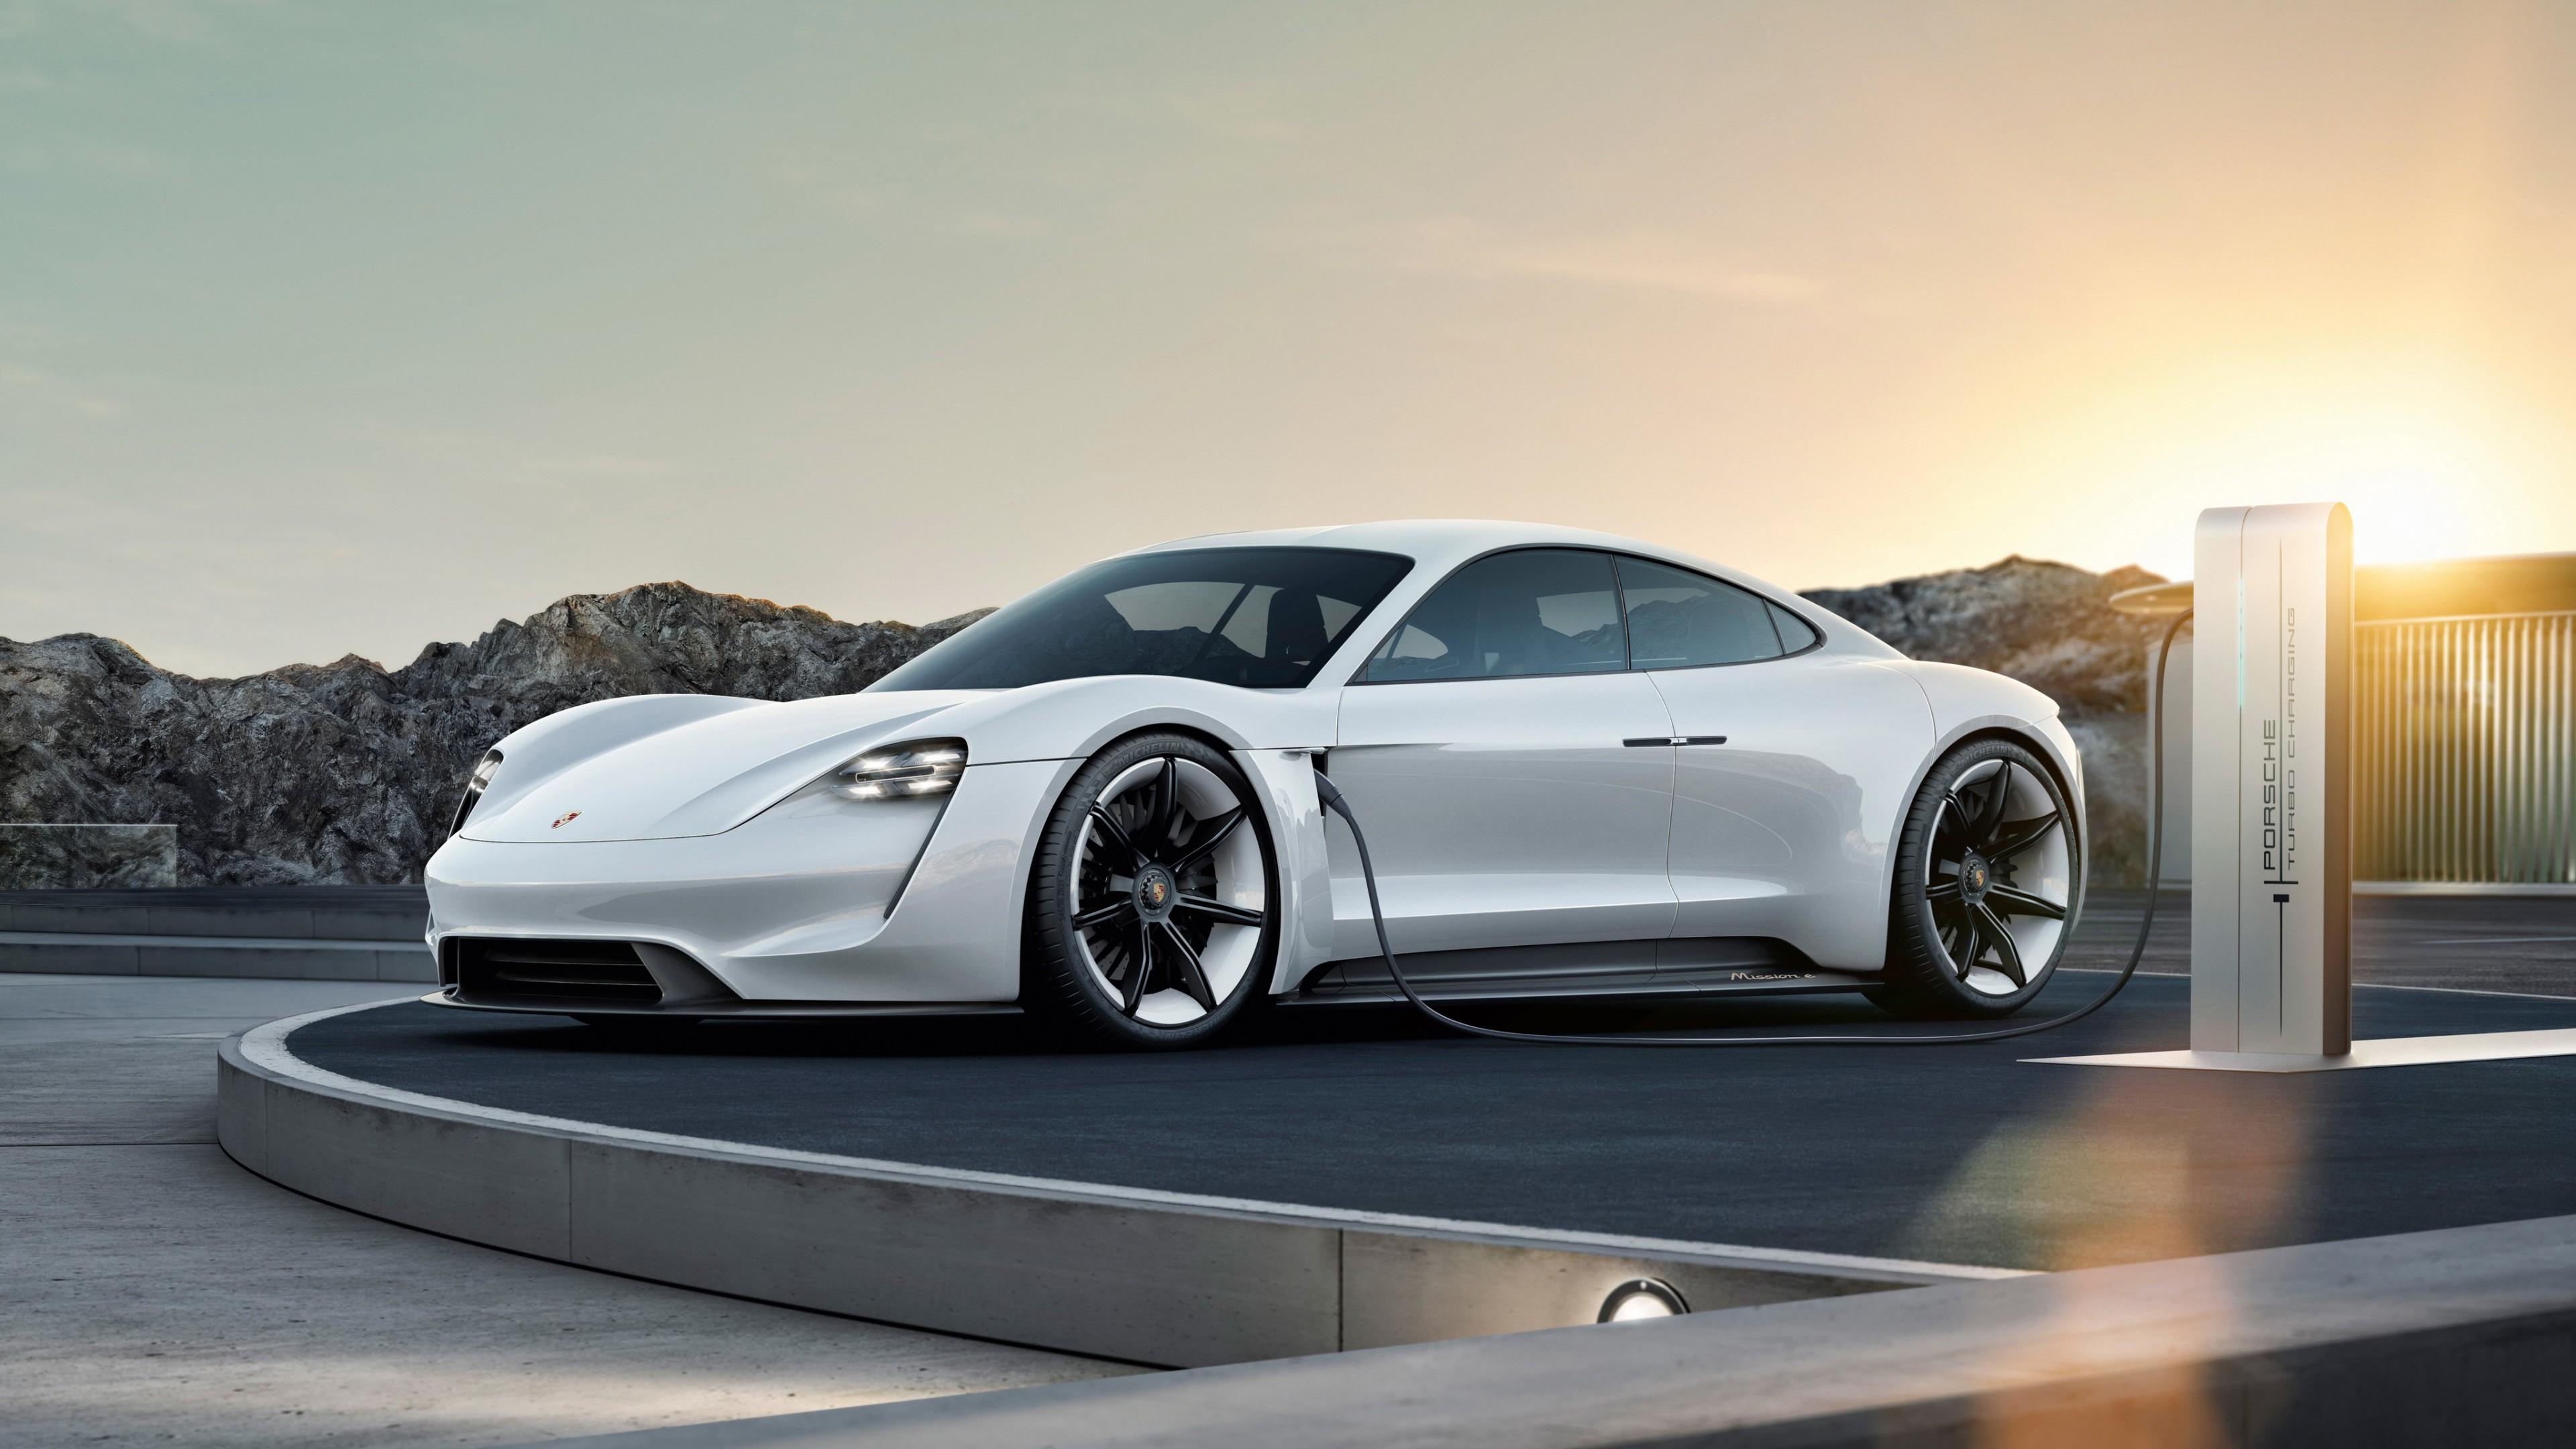 Wallpaper Porsche Taycan Electric Car supercar 2020 Cars 4K 3840x2160